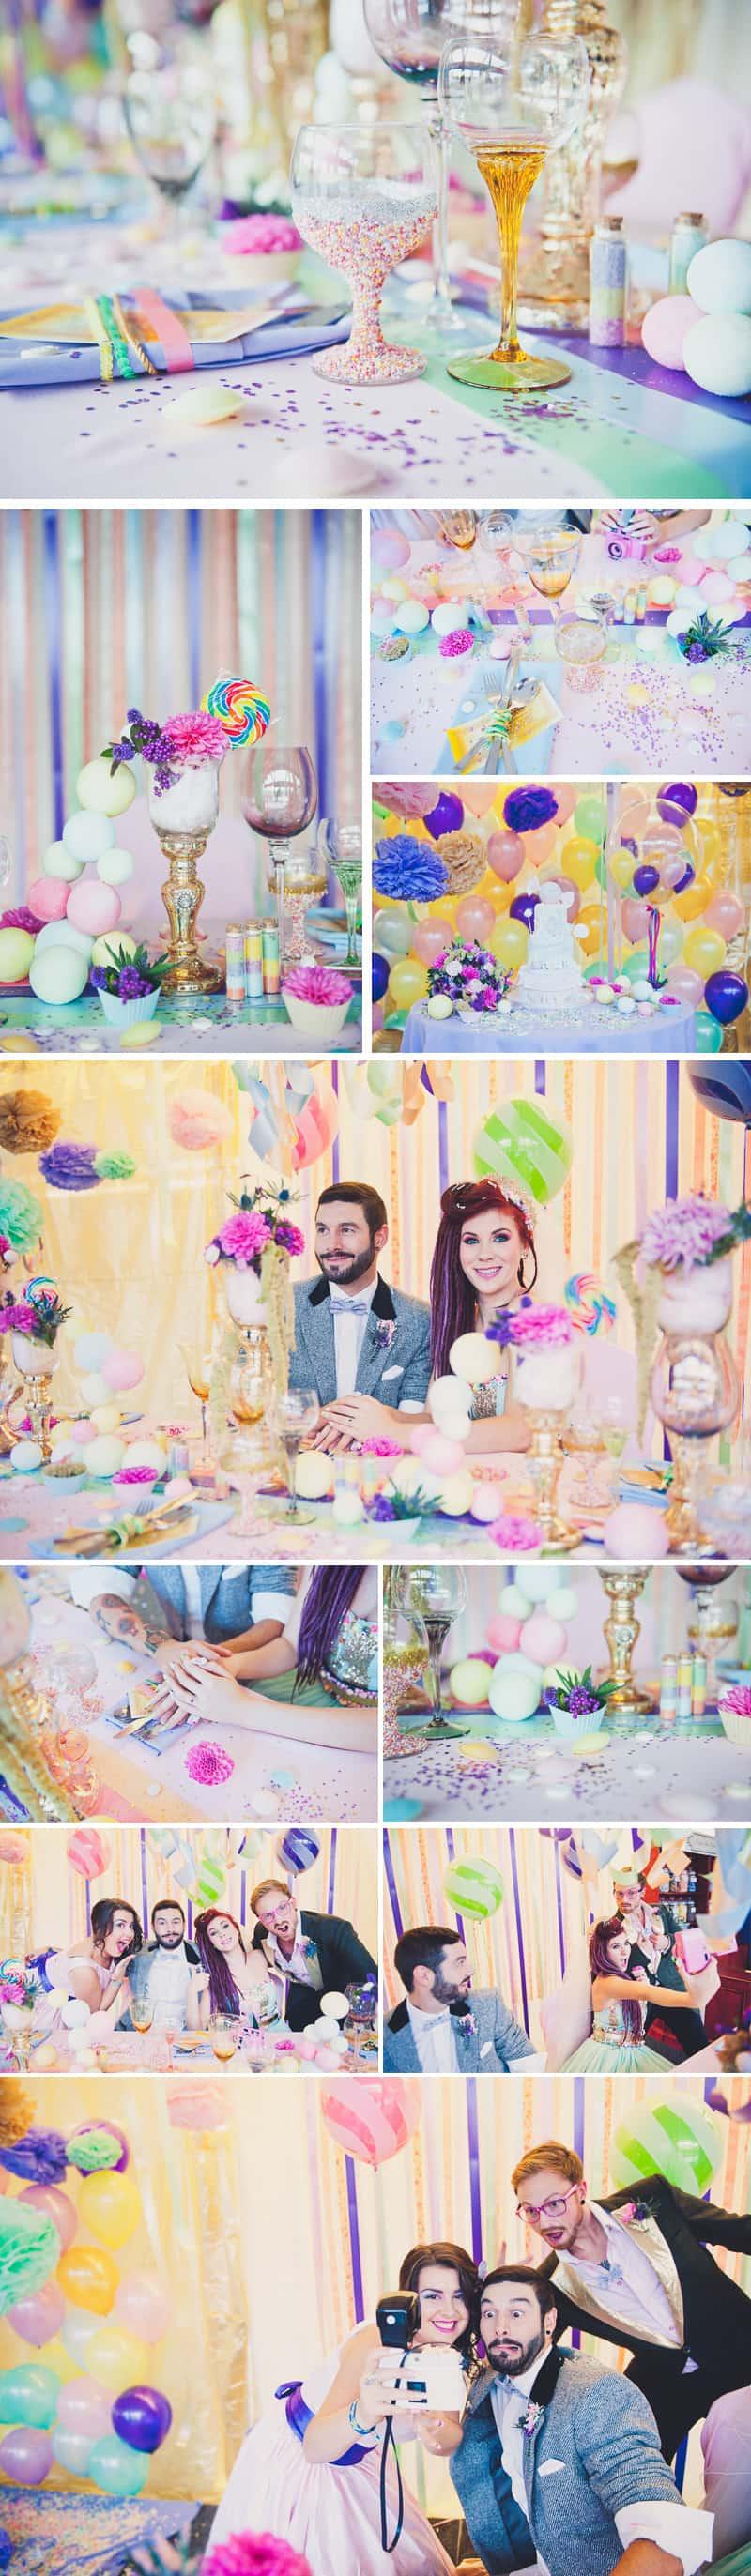 Willy Wonka Weird Wonderful Wedding World 5